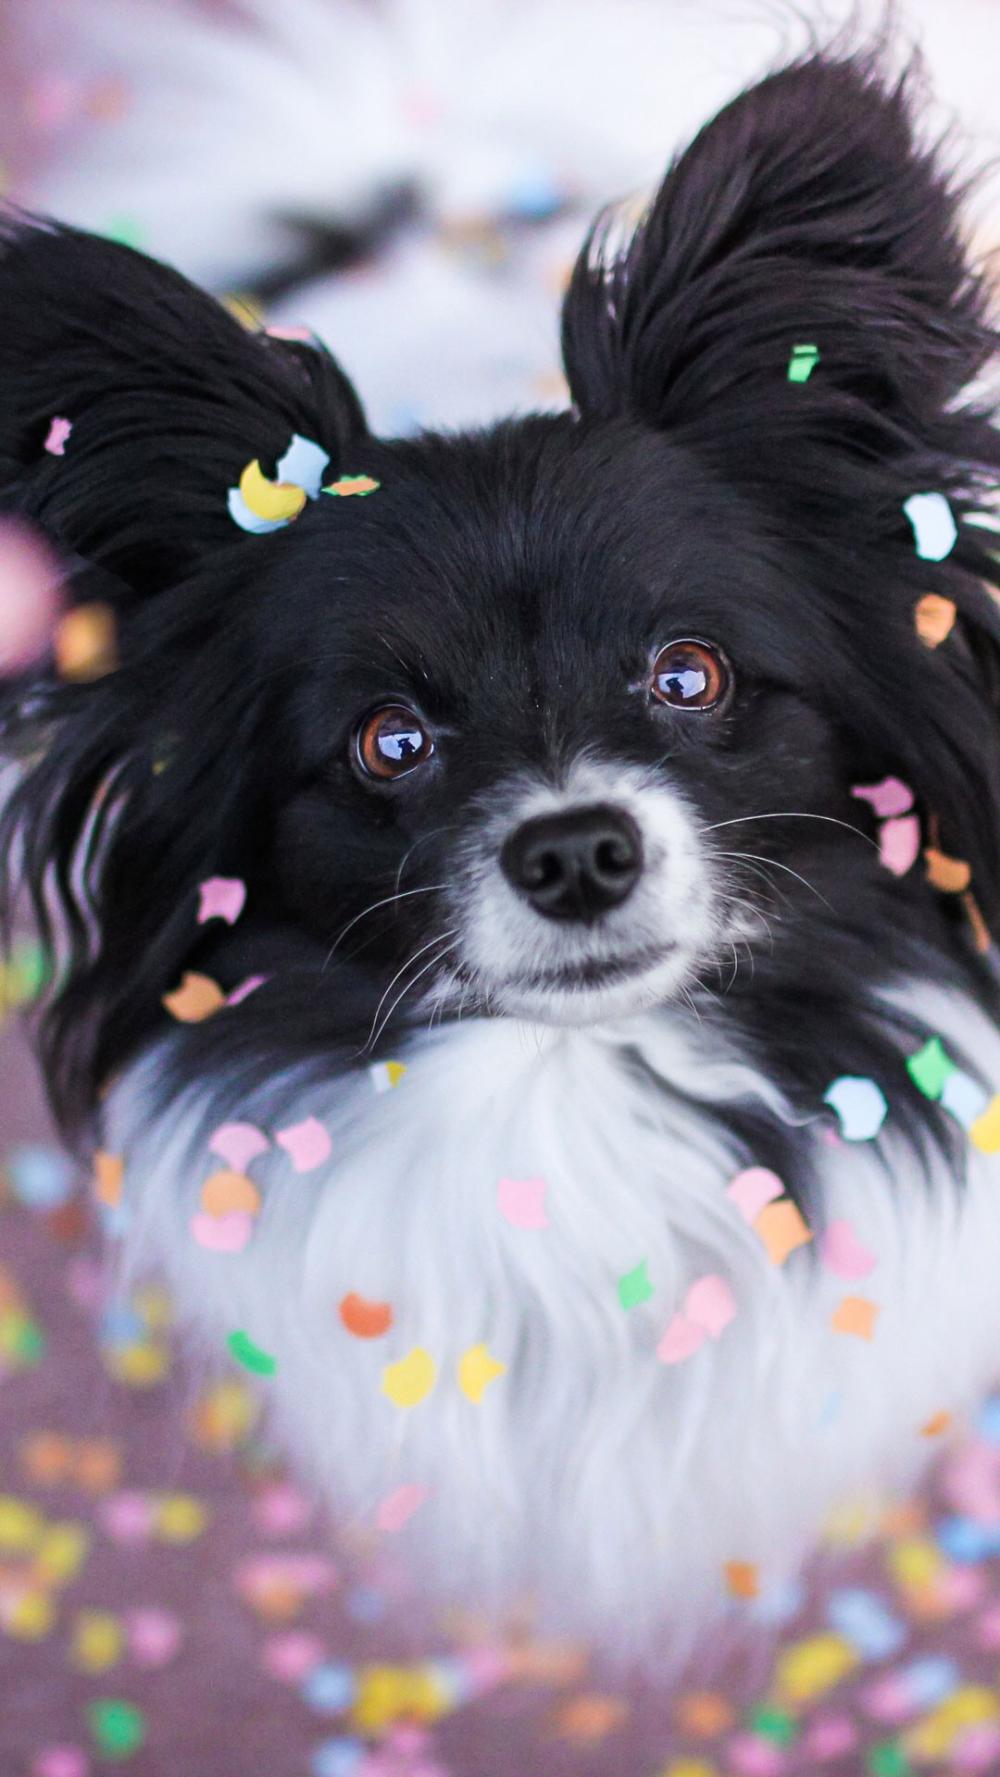 Loyal Cute Pet Dog Mobile Wallpaper Dog Cute Animals Loyalty